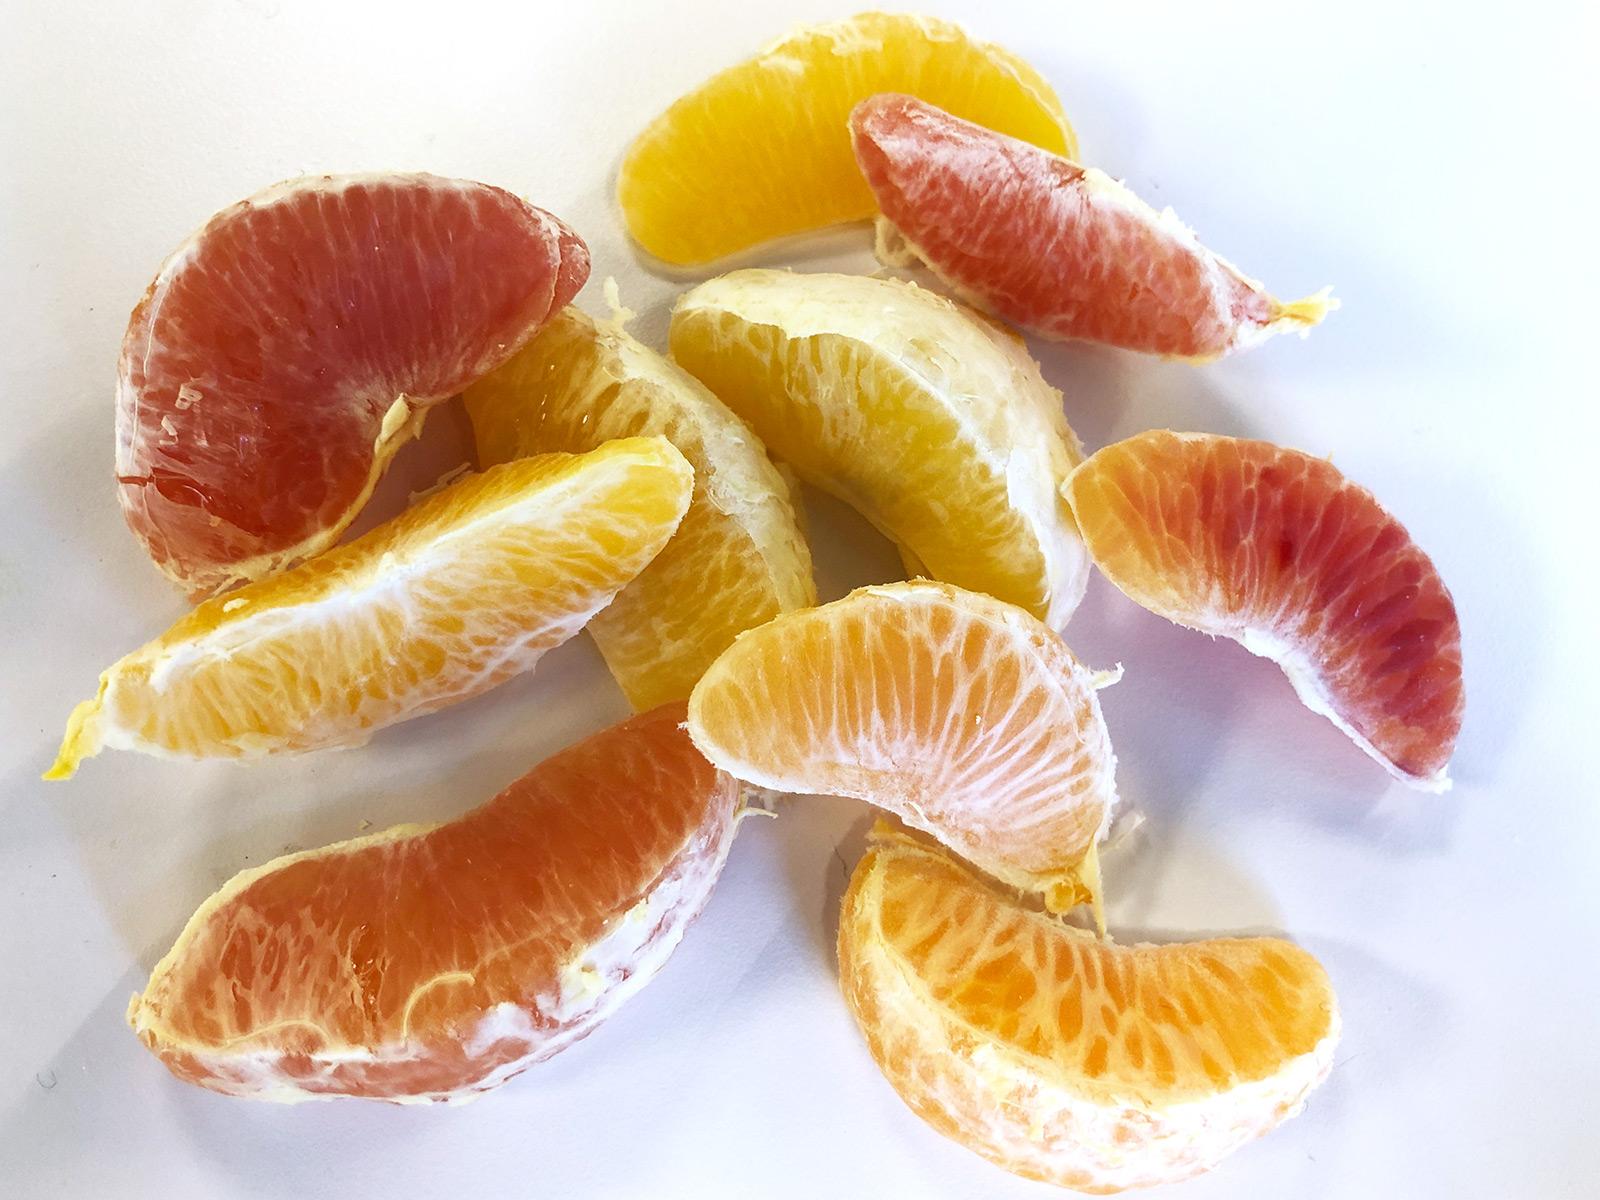 orange-segments.jpg